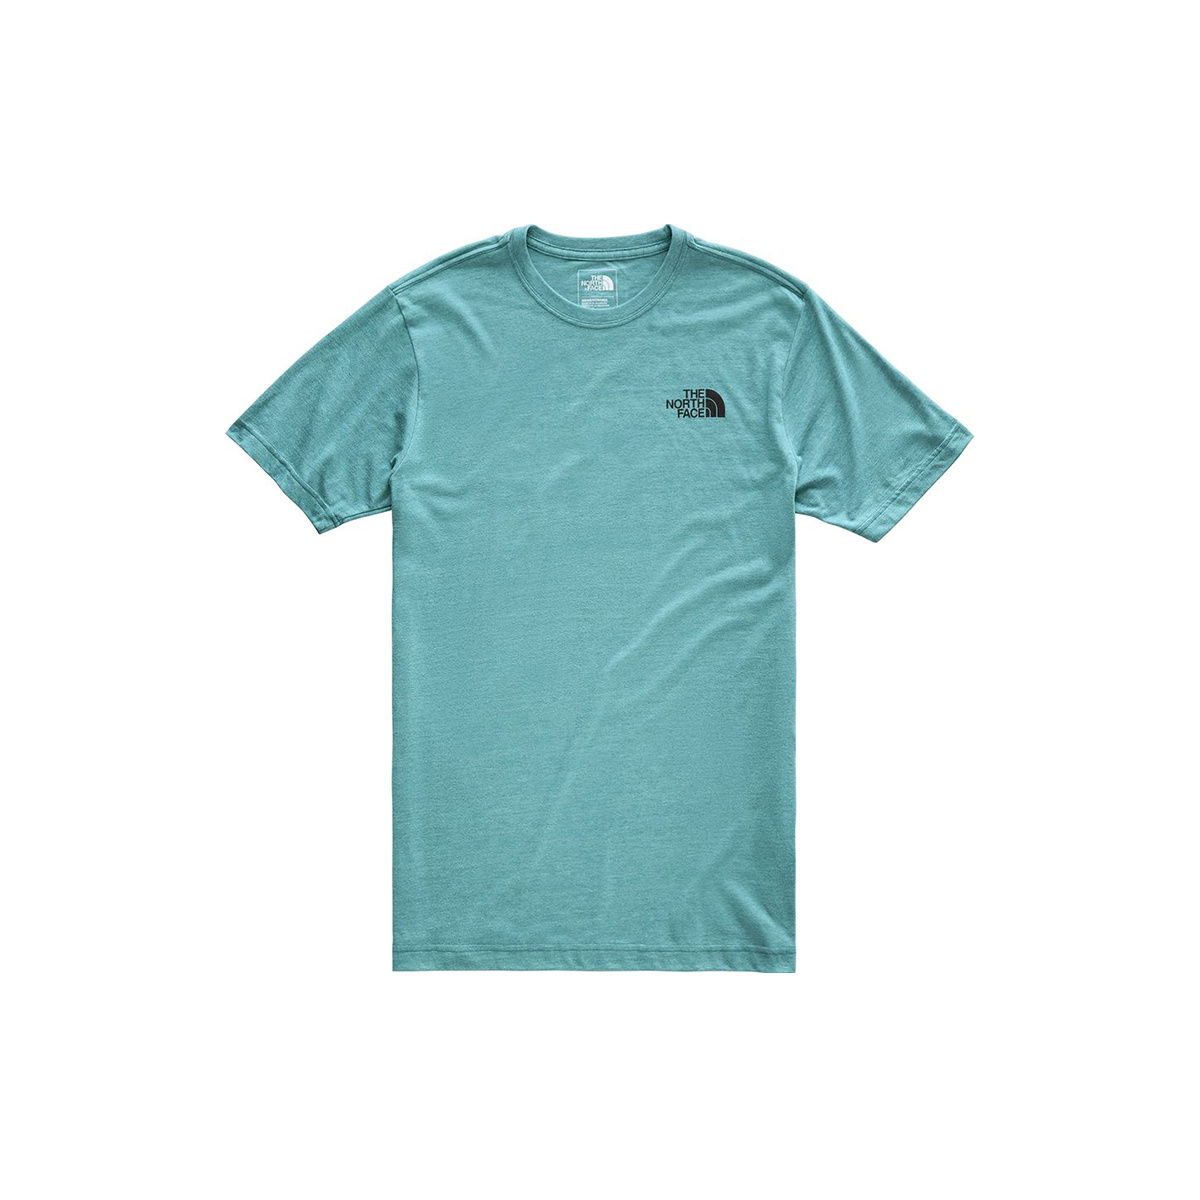 The North Face Men's  Short Sleeve Rest Assured Tri-Blend Tee